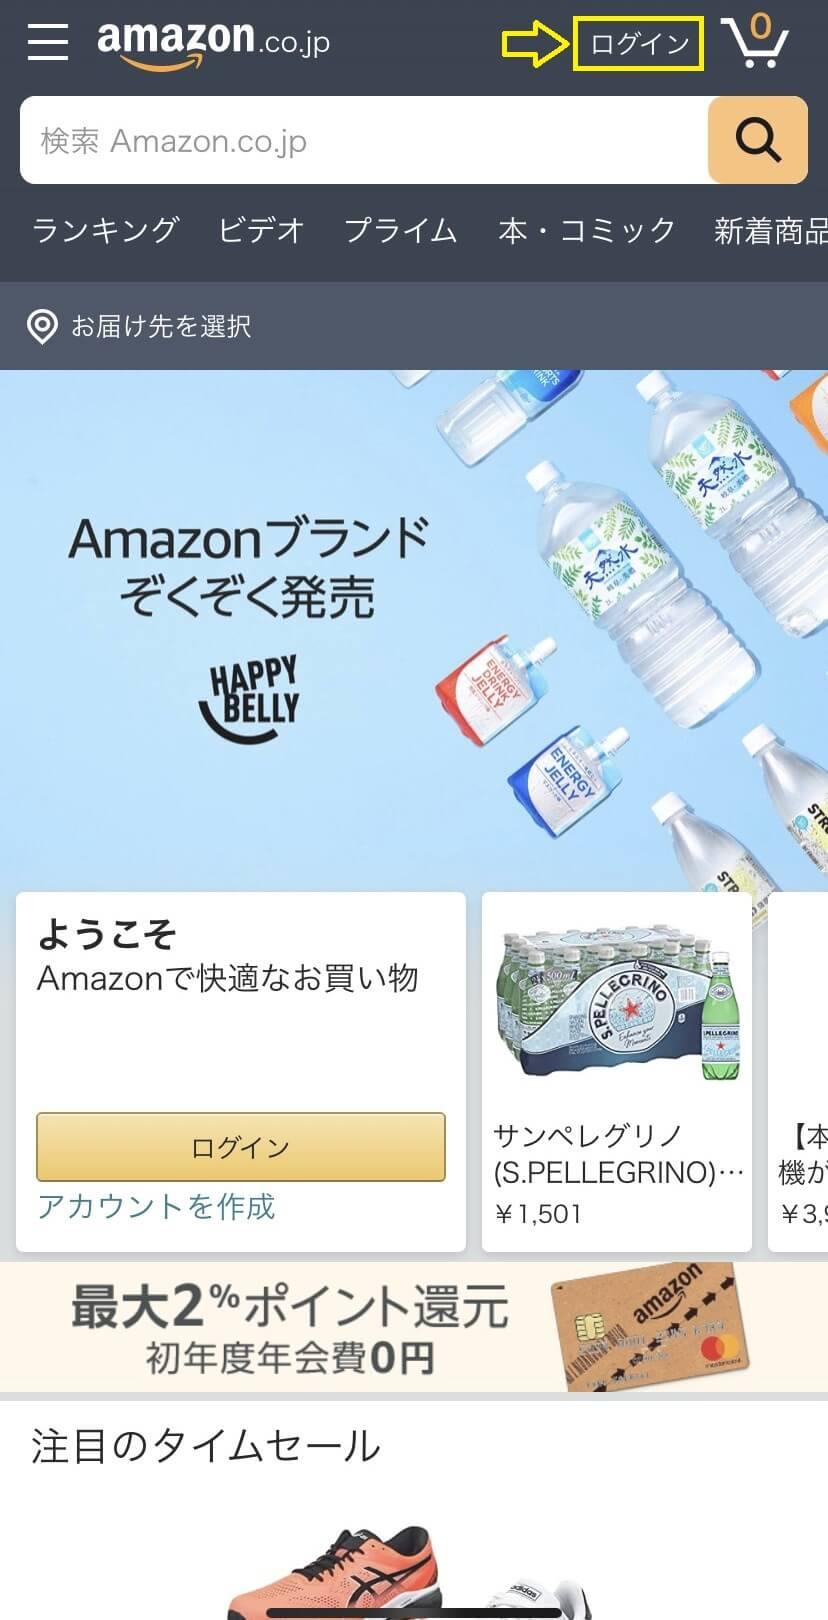 Amazonギフト券を購入する方法